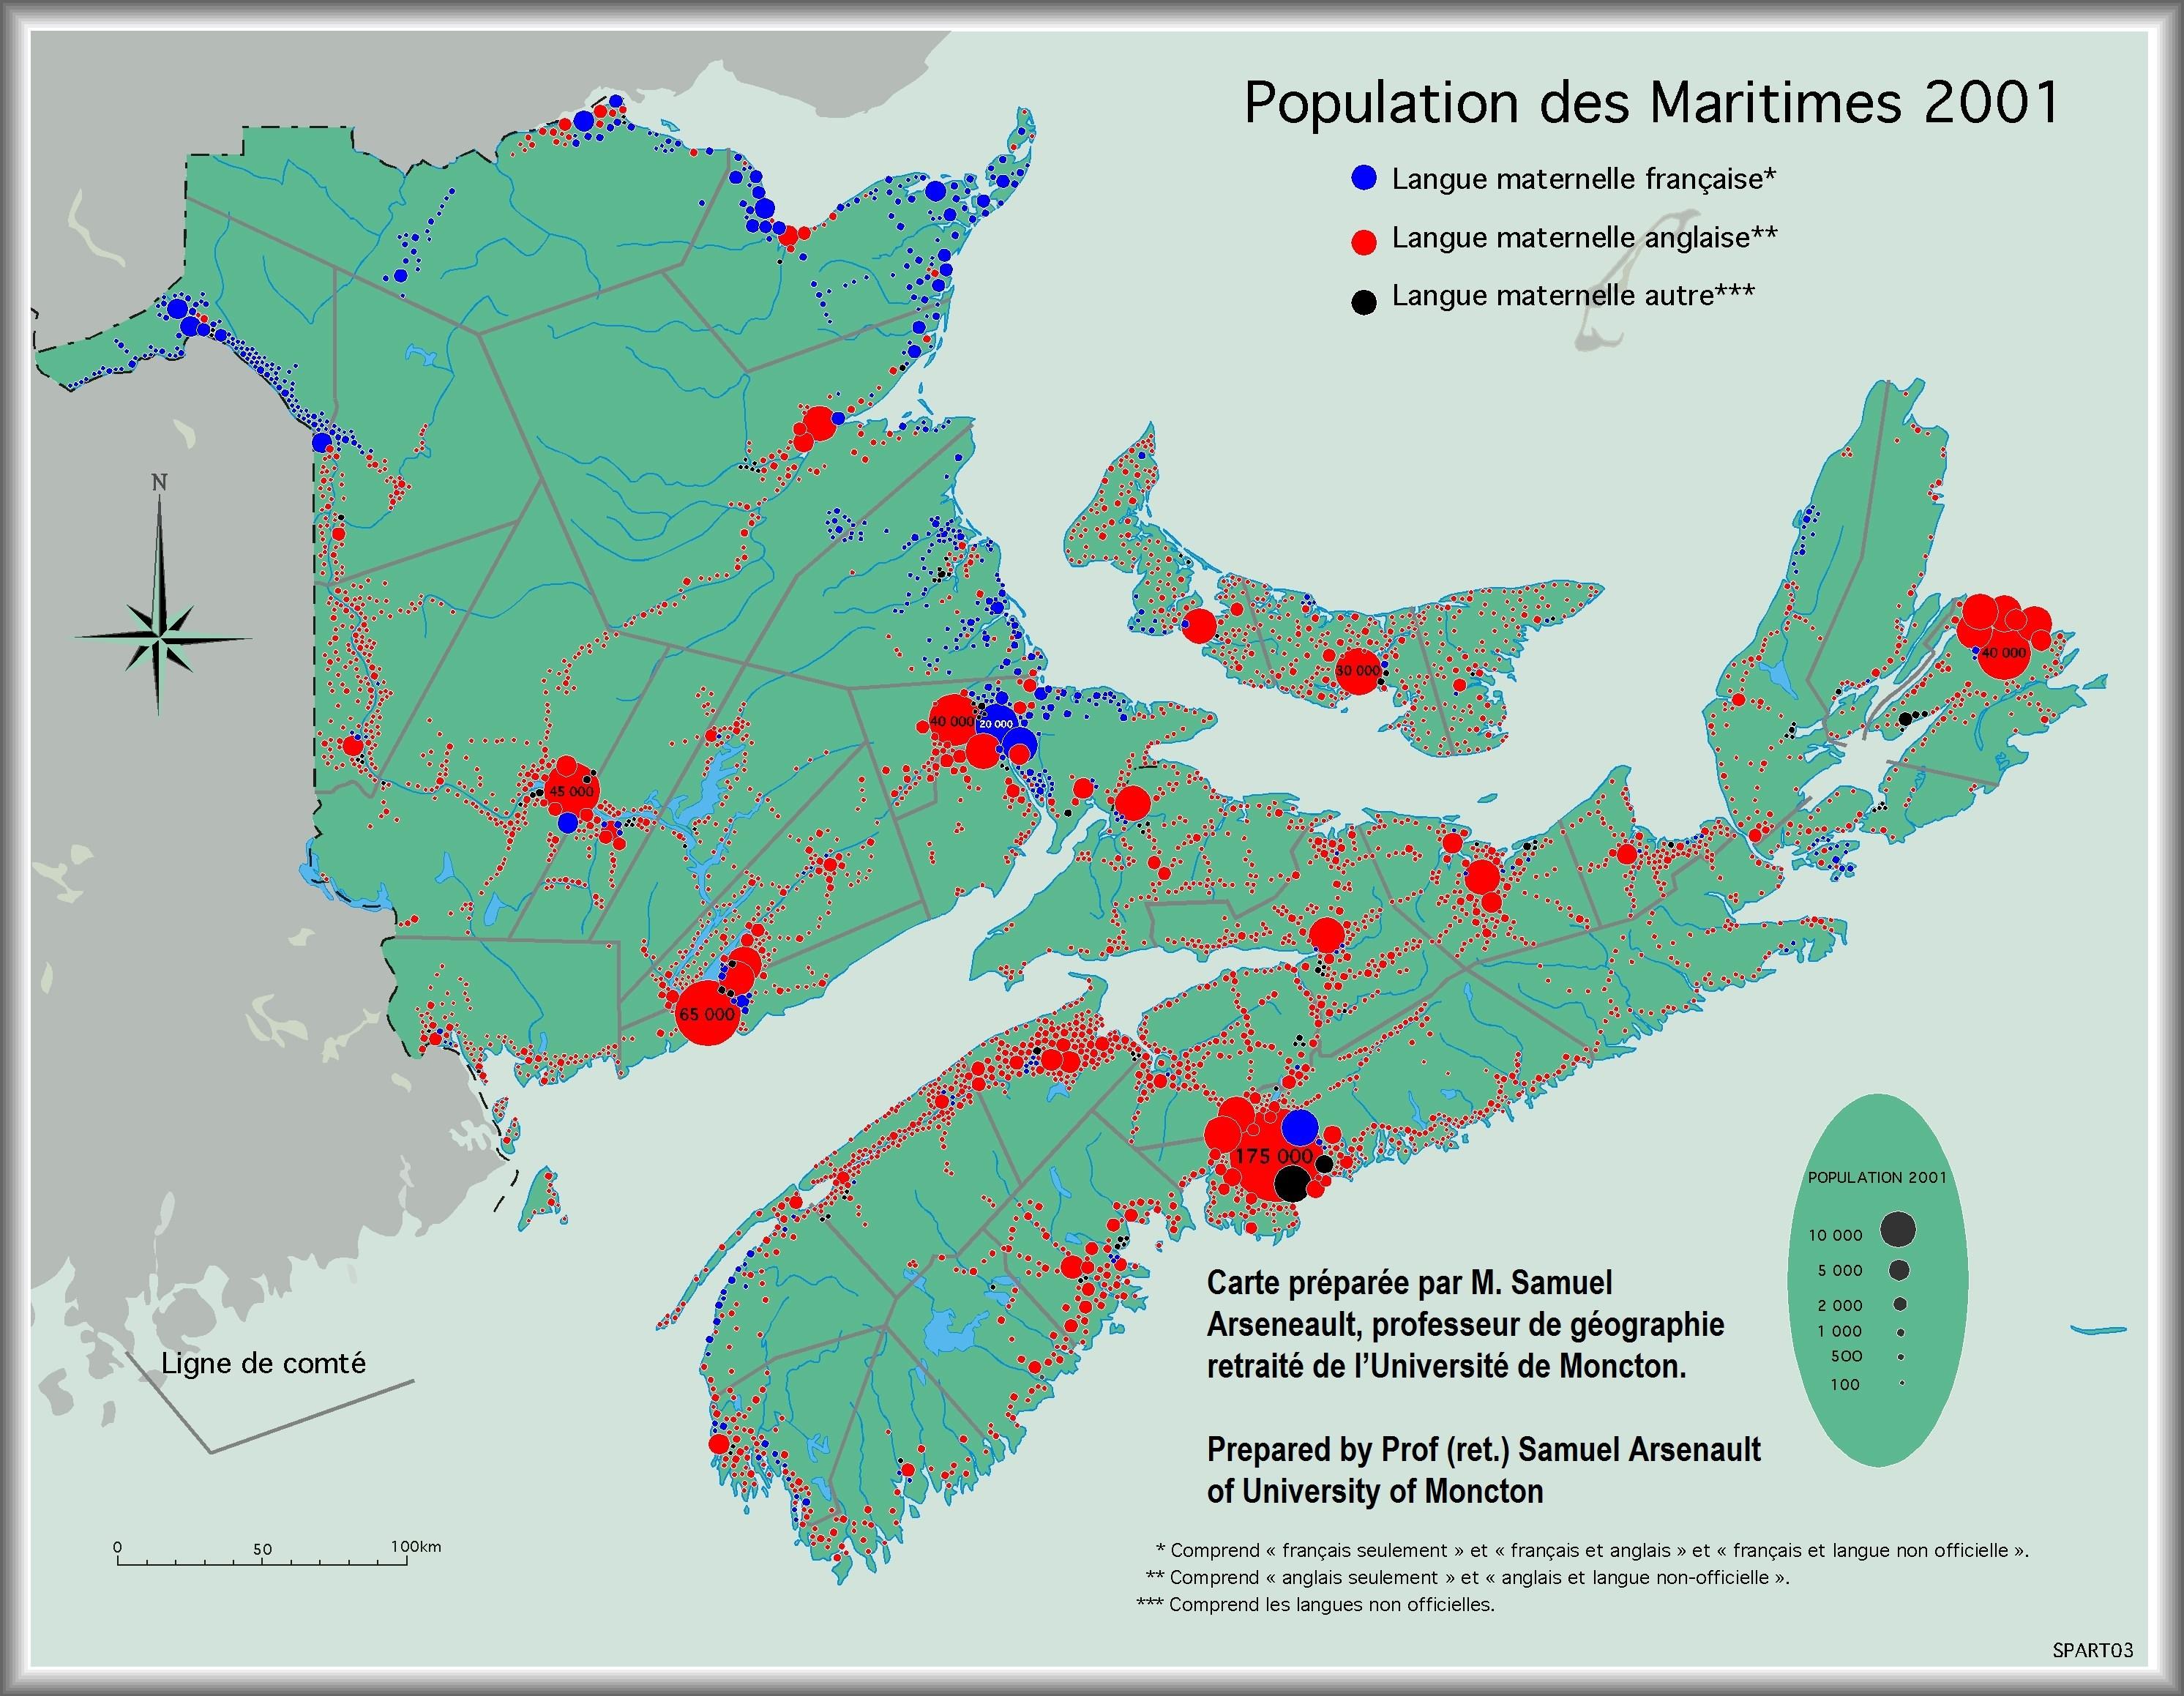 Maritime population  community distribution based on language